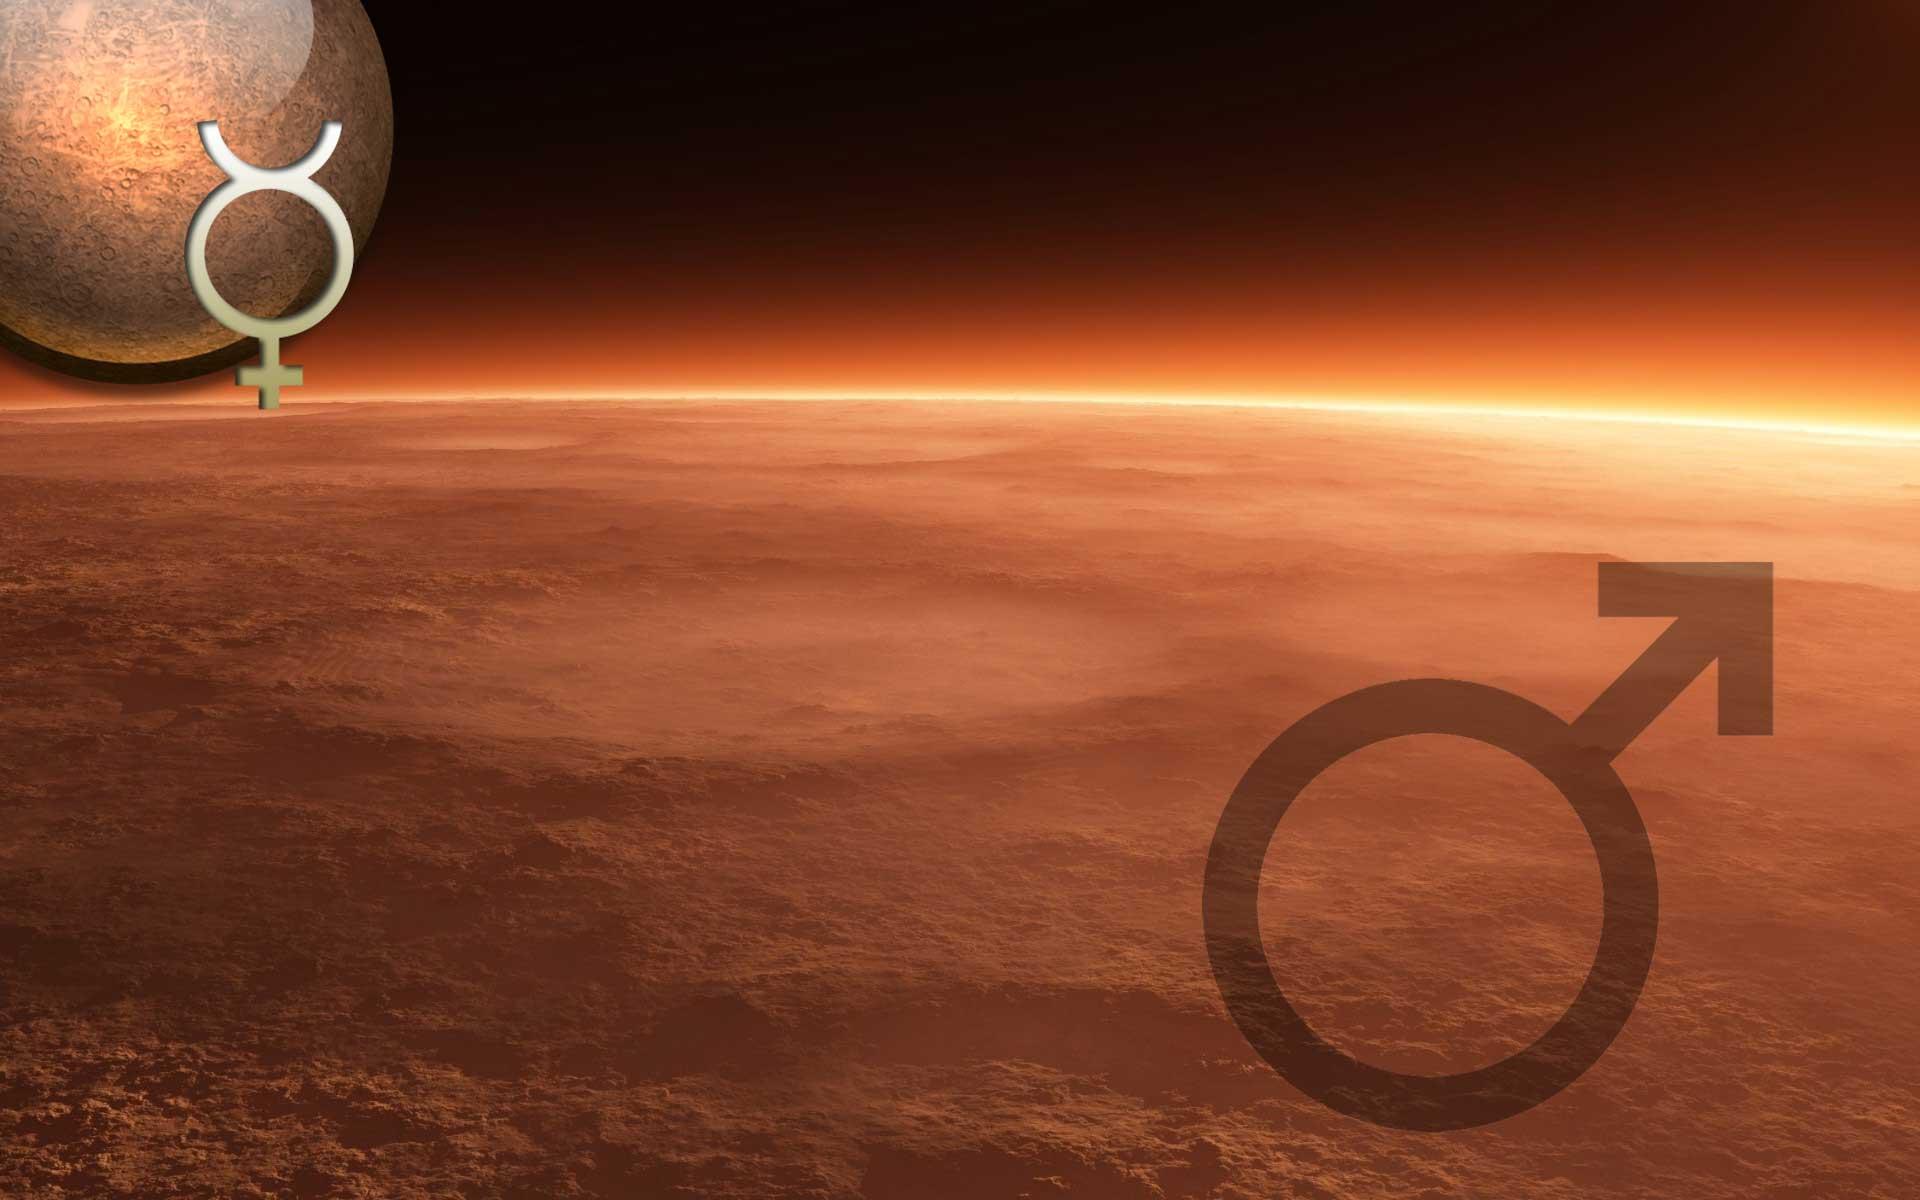 Транзитный Марс в аспекте к Марсу